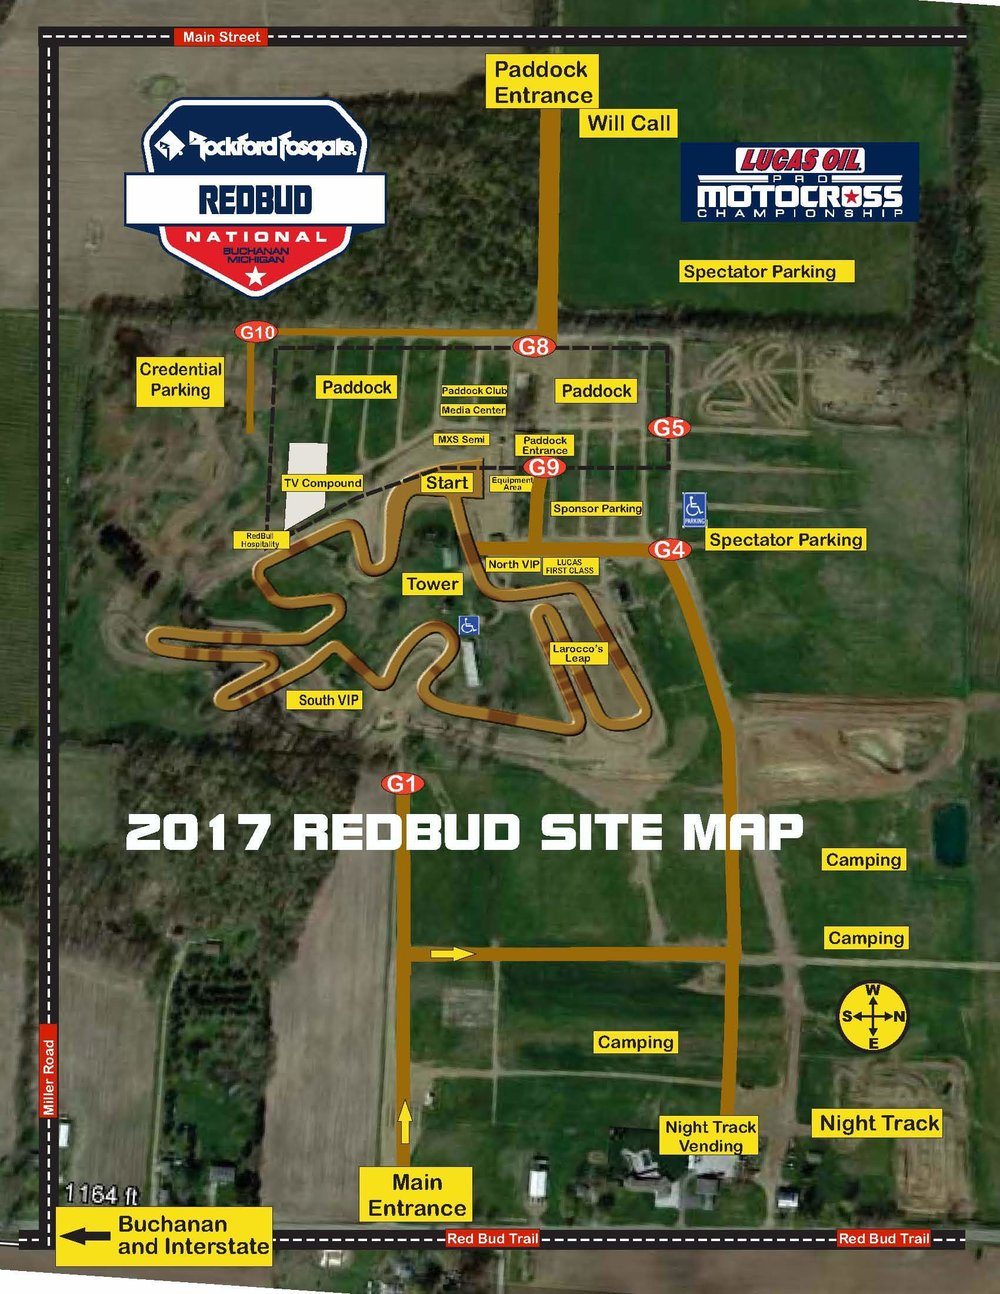 2017 Red Bud Site map.jpg